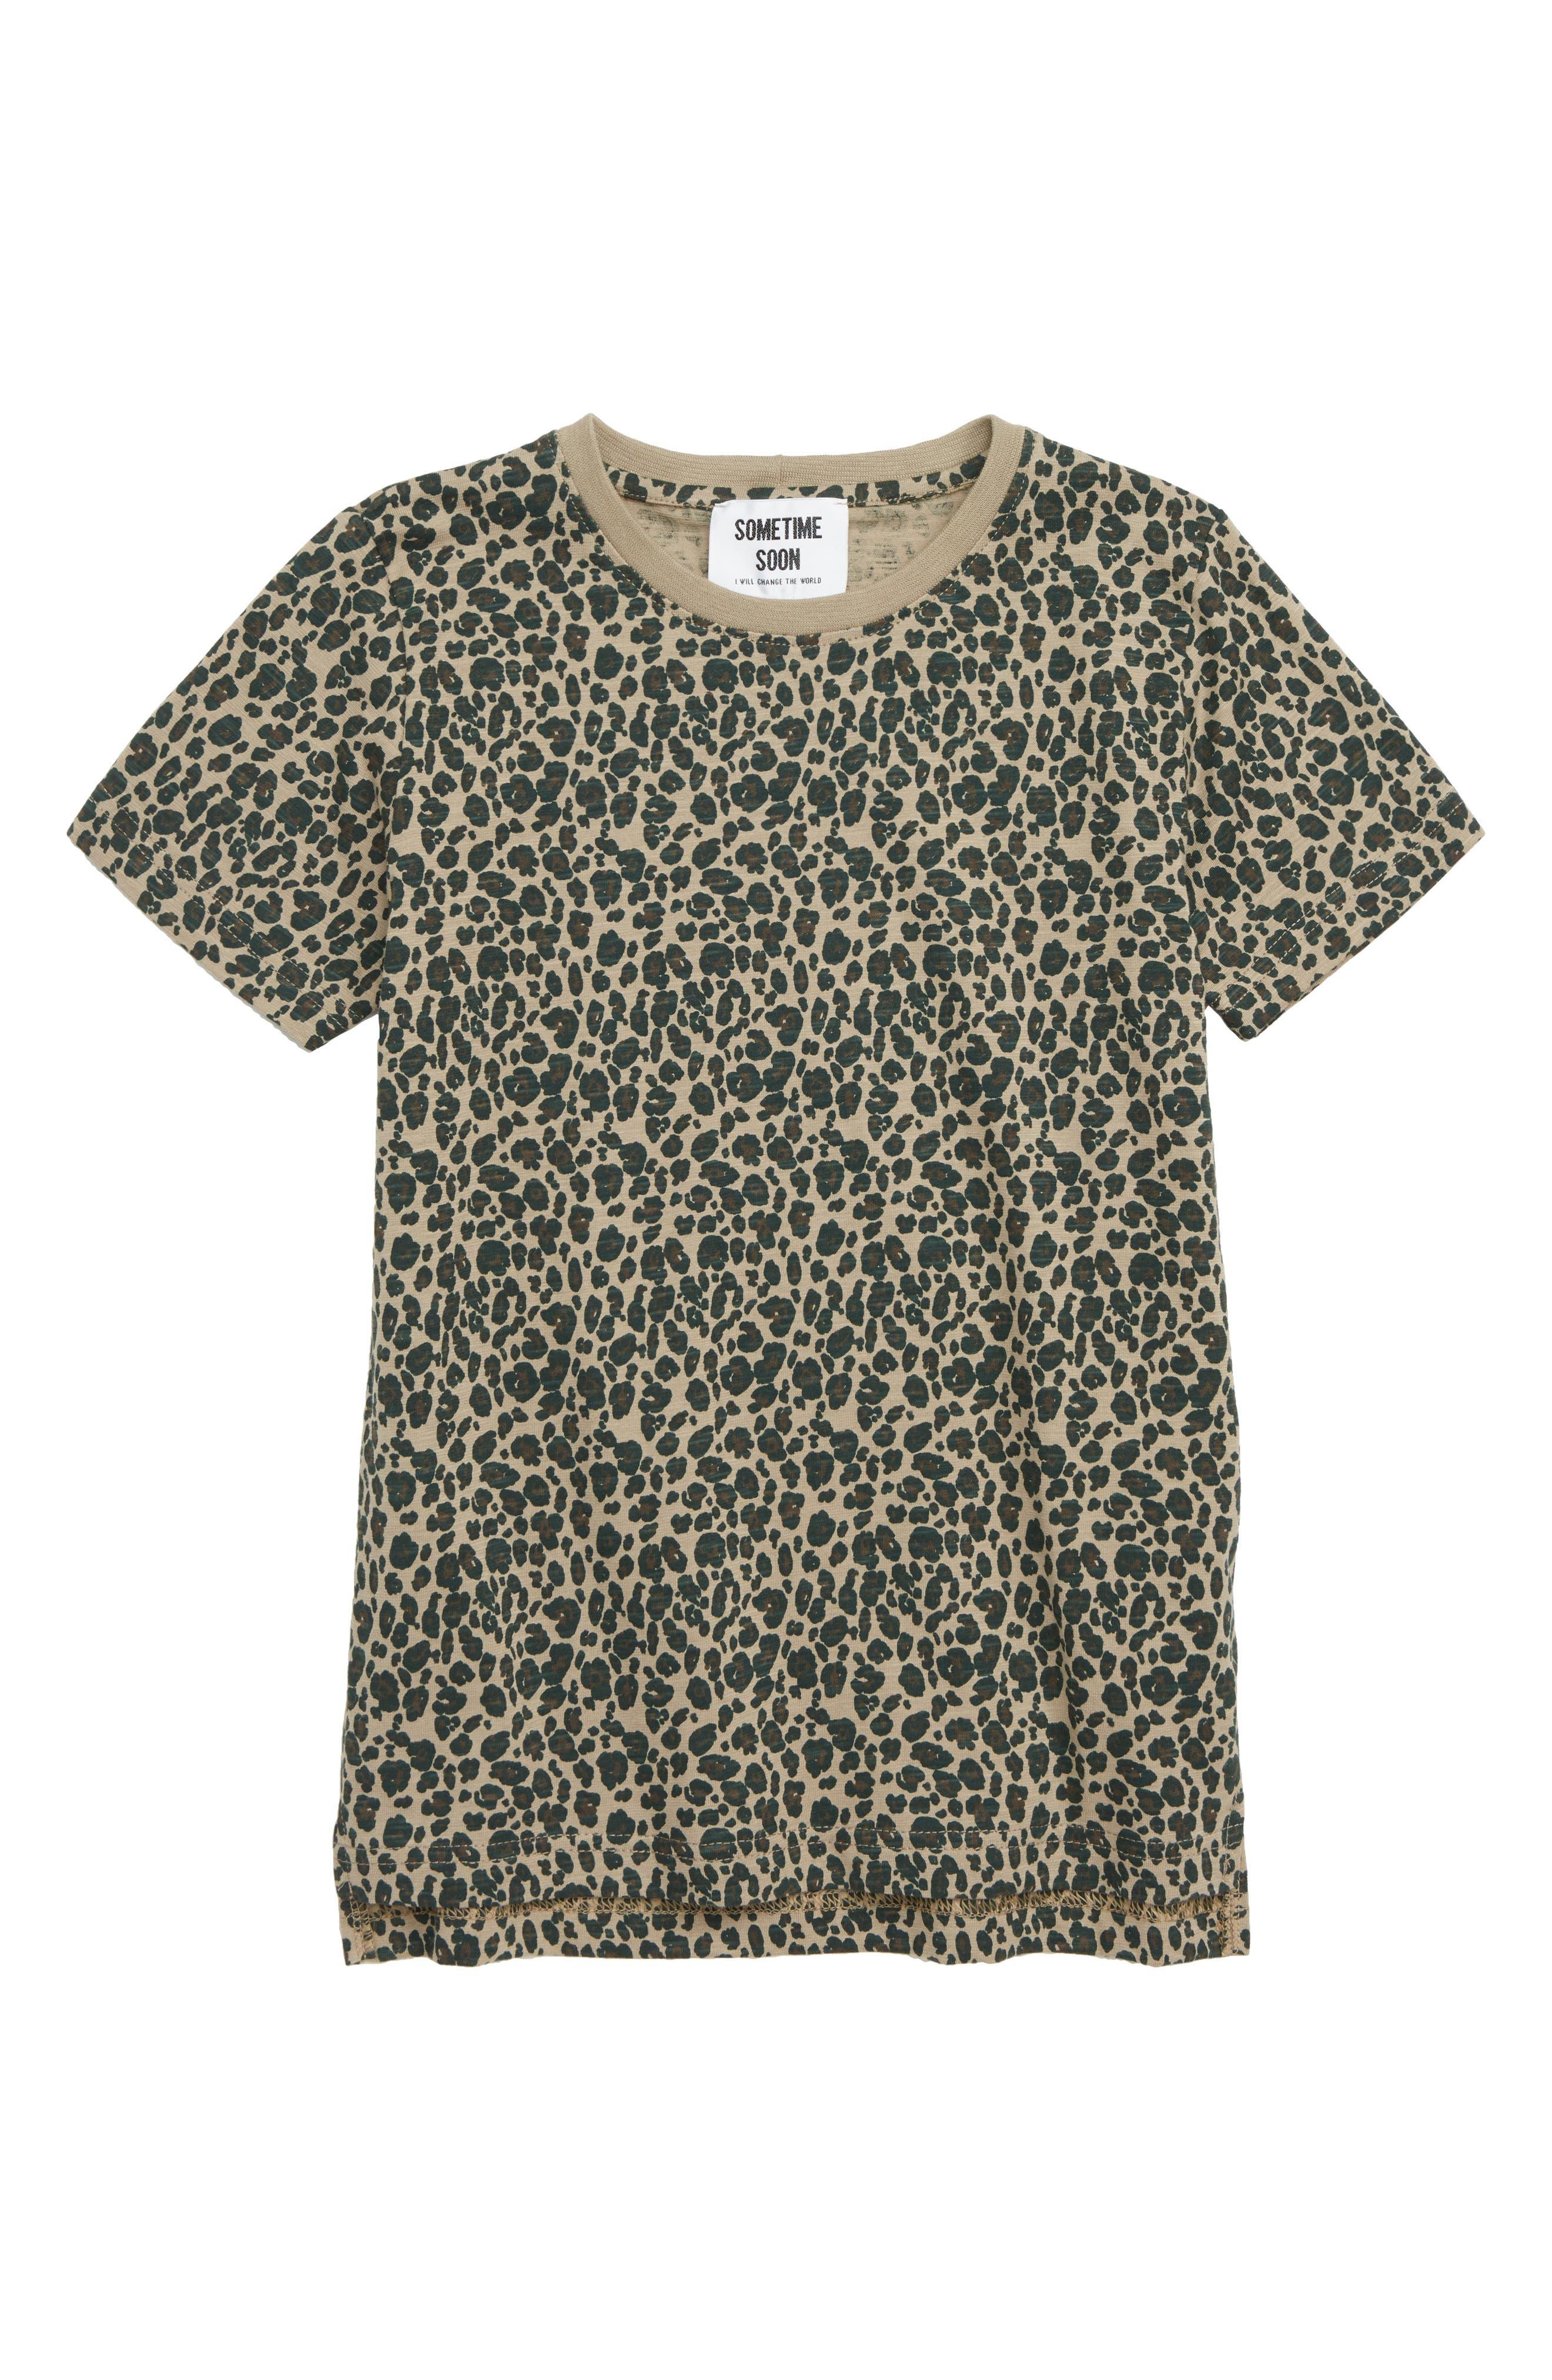 Adam T-Shirt,                             Main thumbnail 1, color,                             200